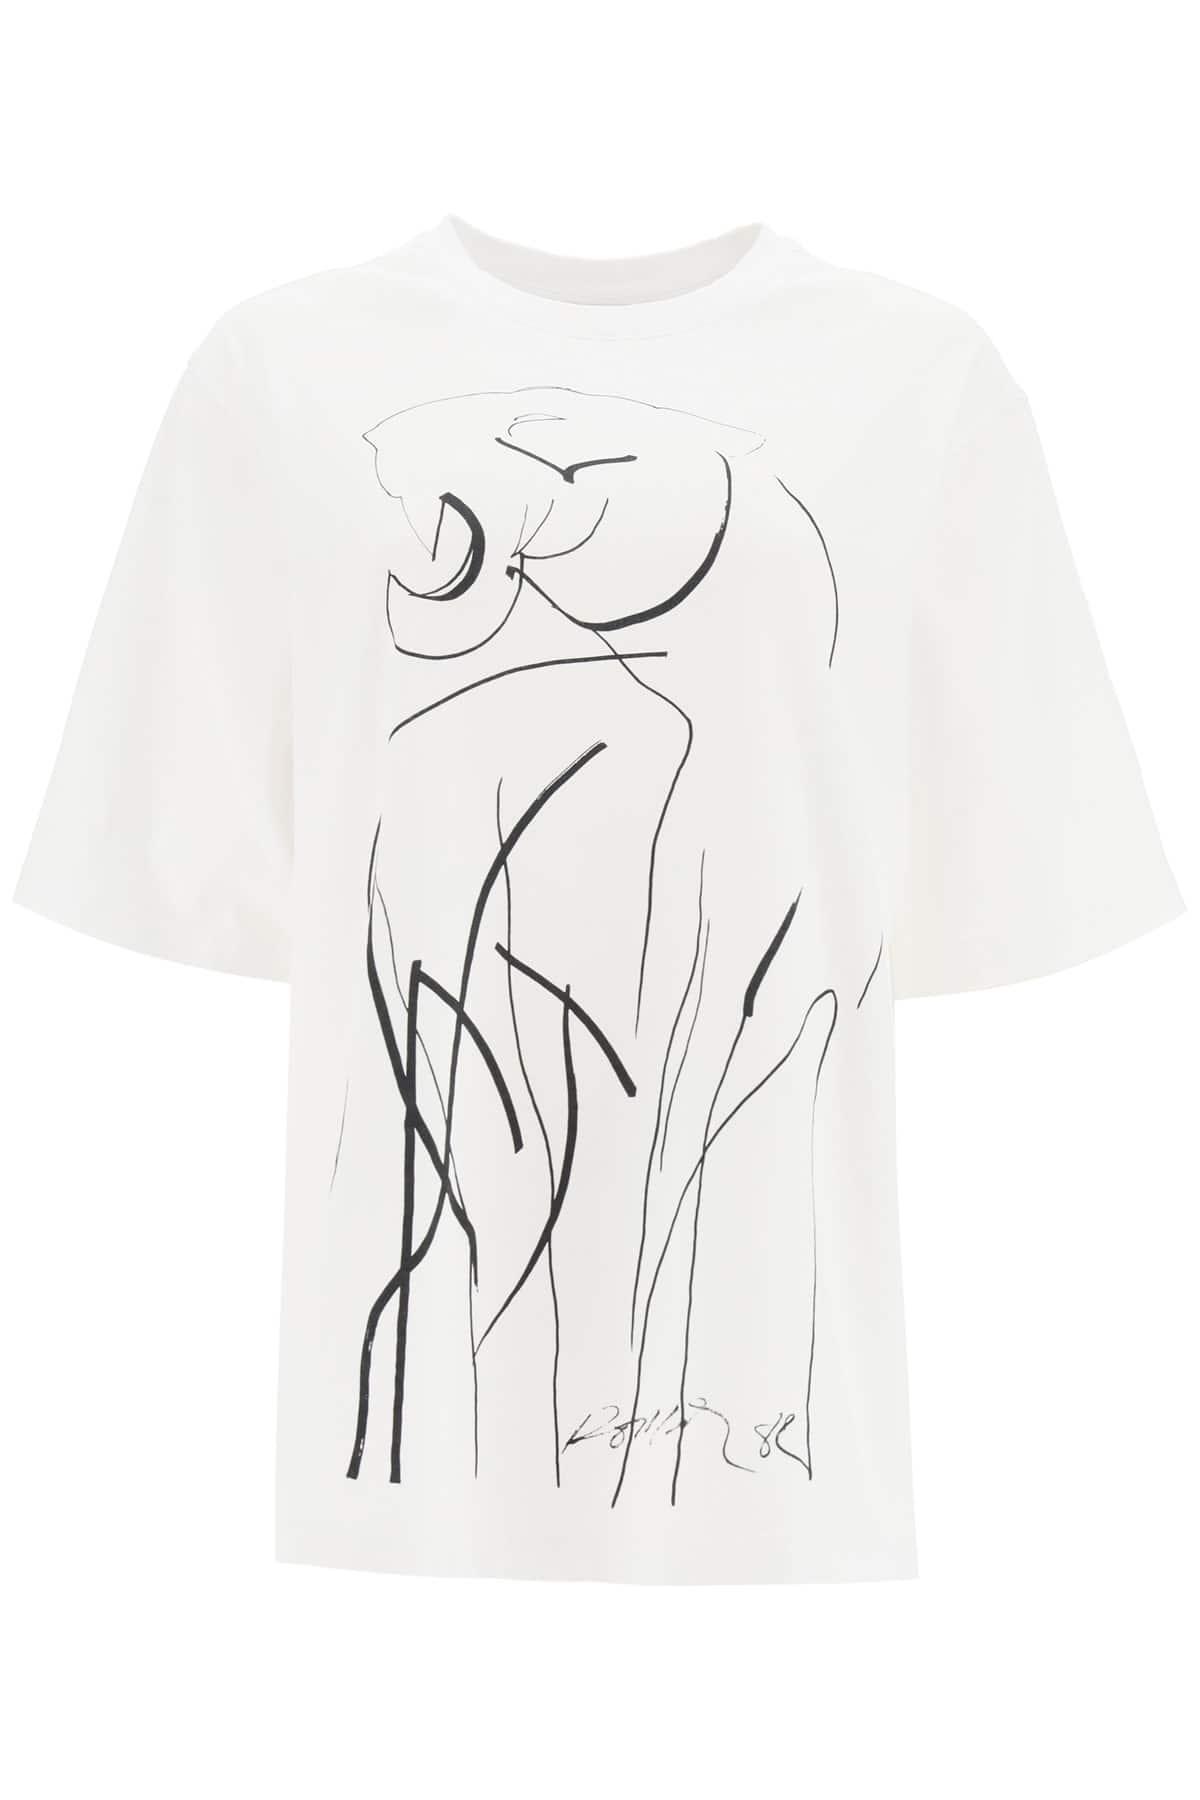 KENZO TIGER OVERSIZED T-SHIRT S White, Black Cotton